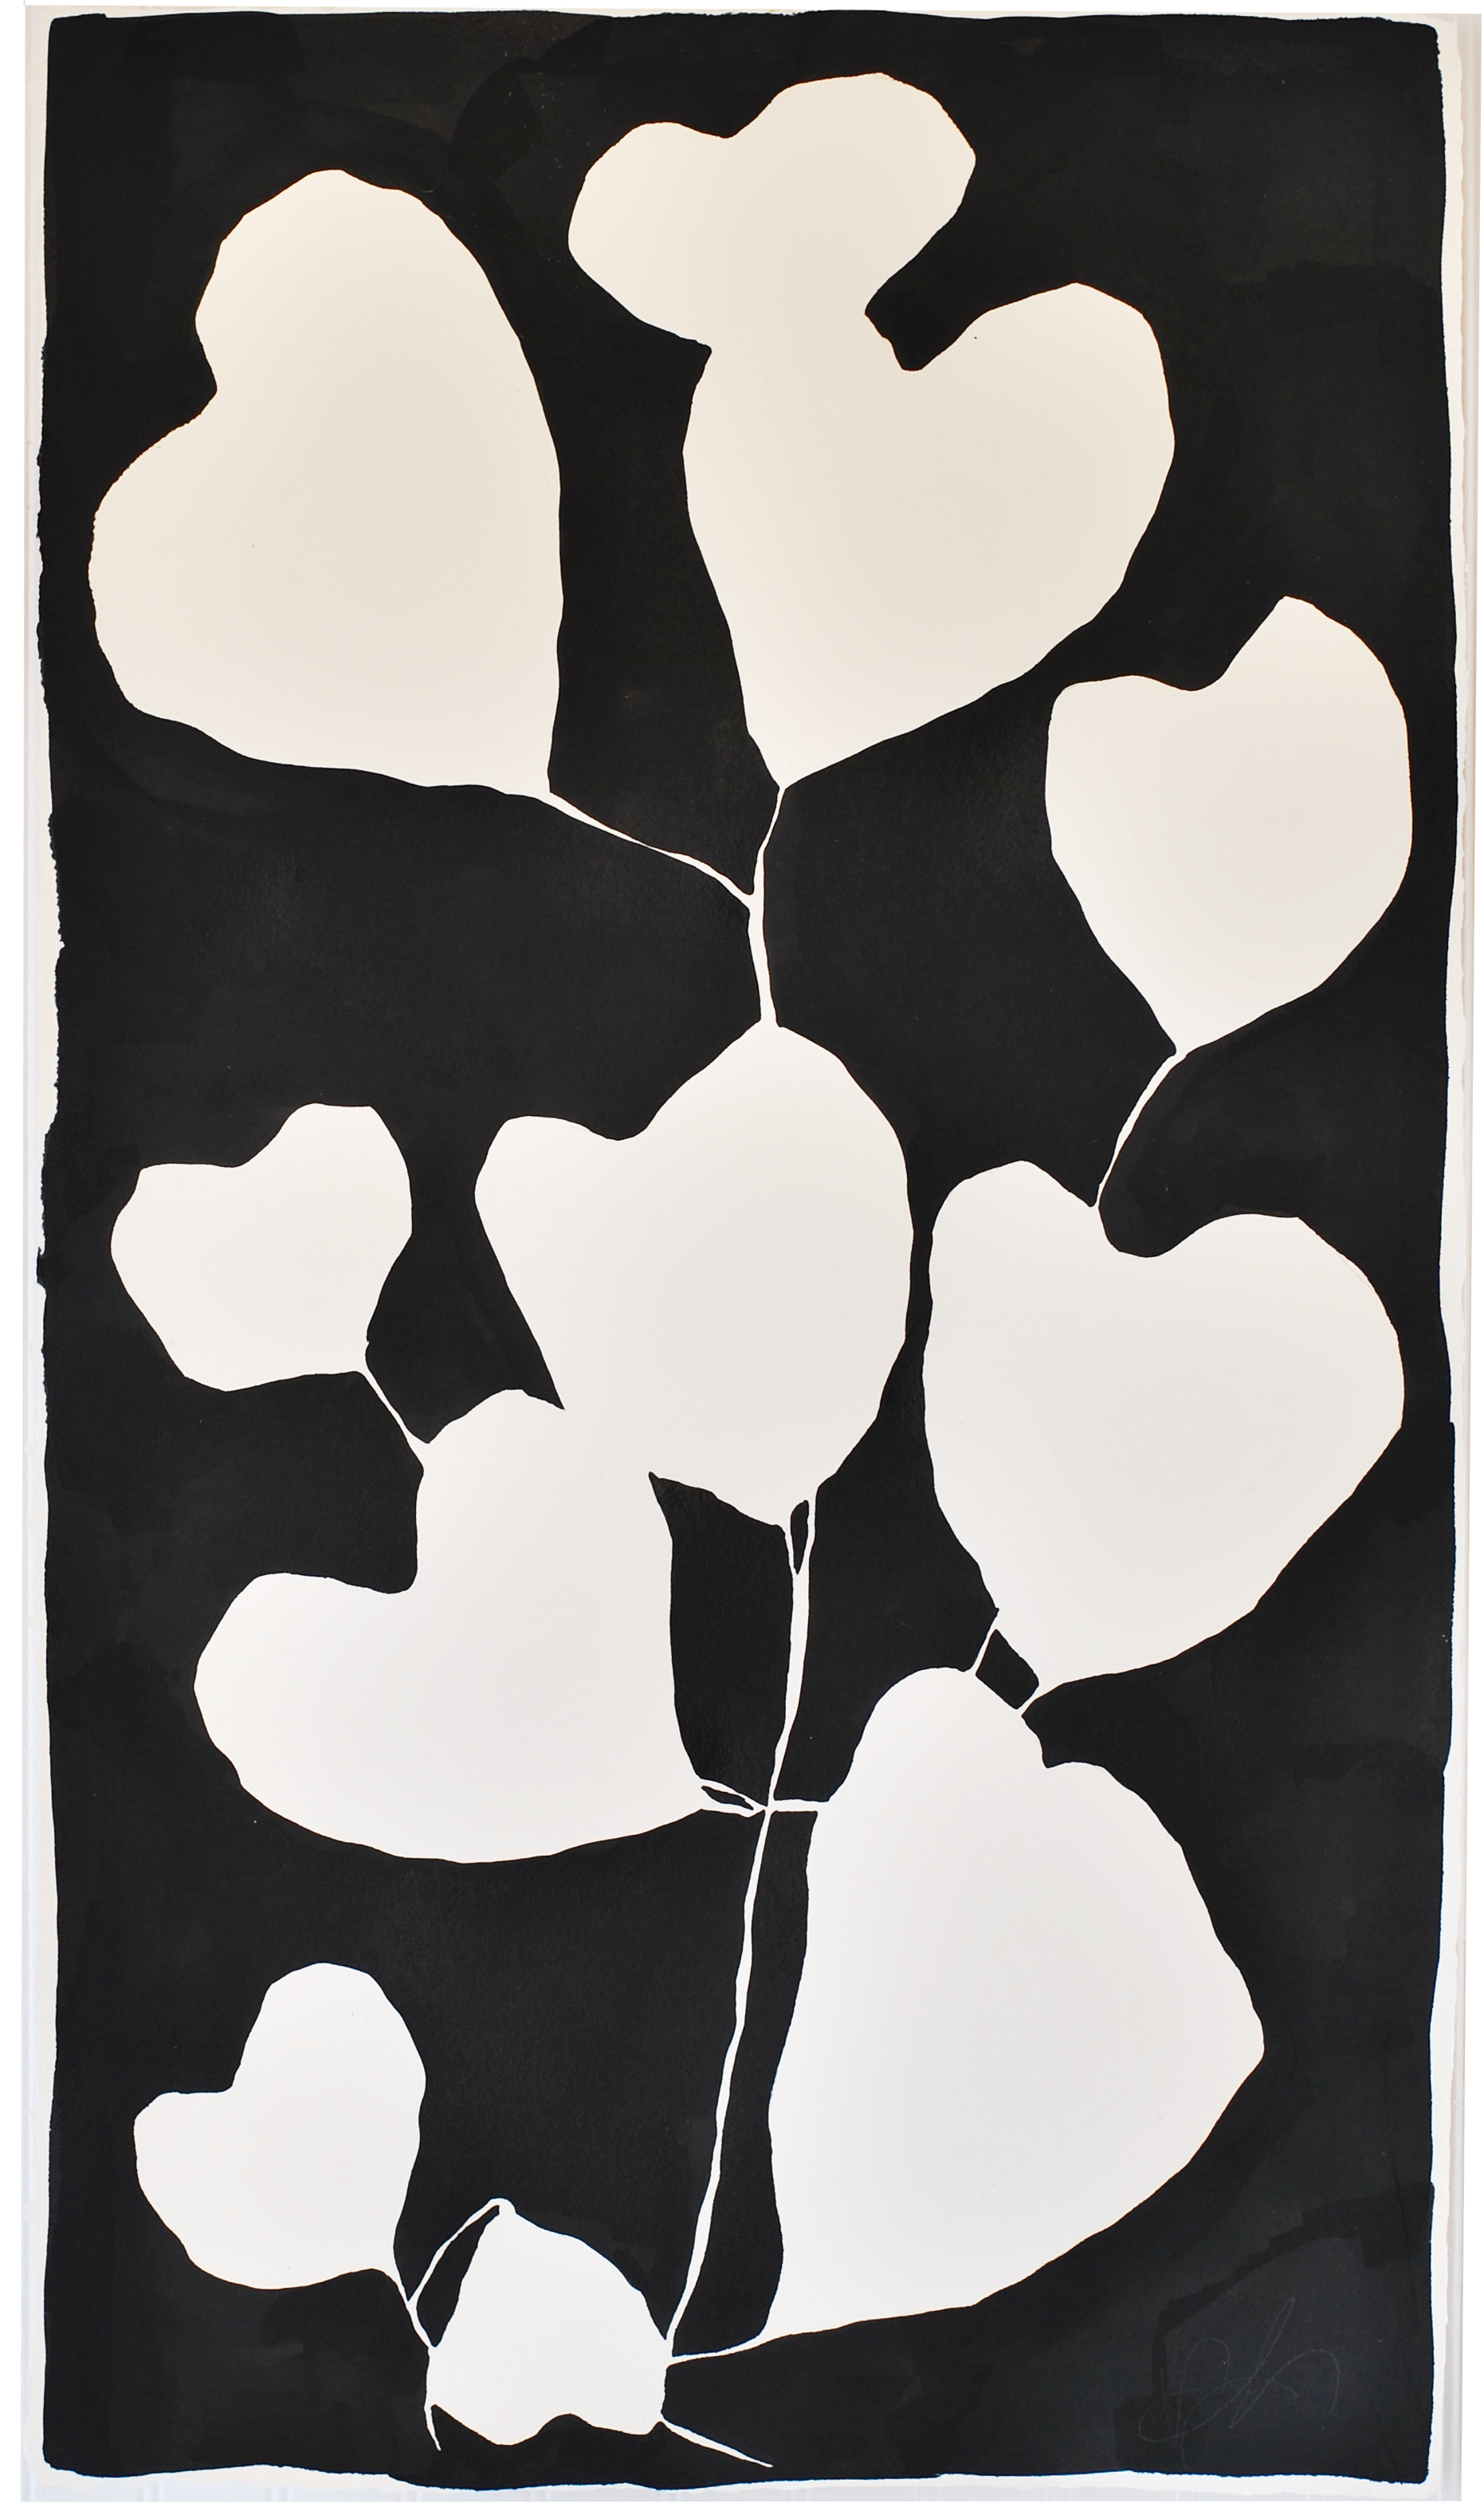 Heart plant -lo.jpg